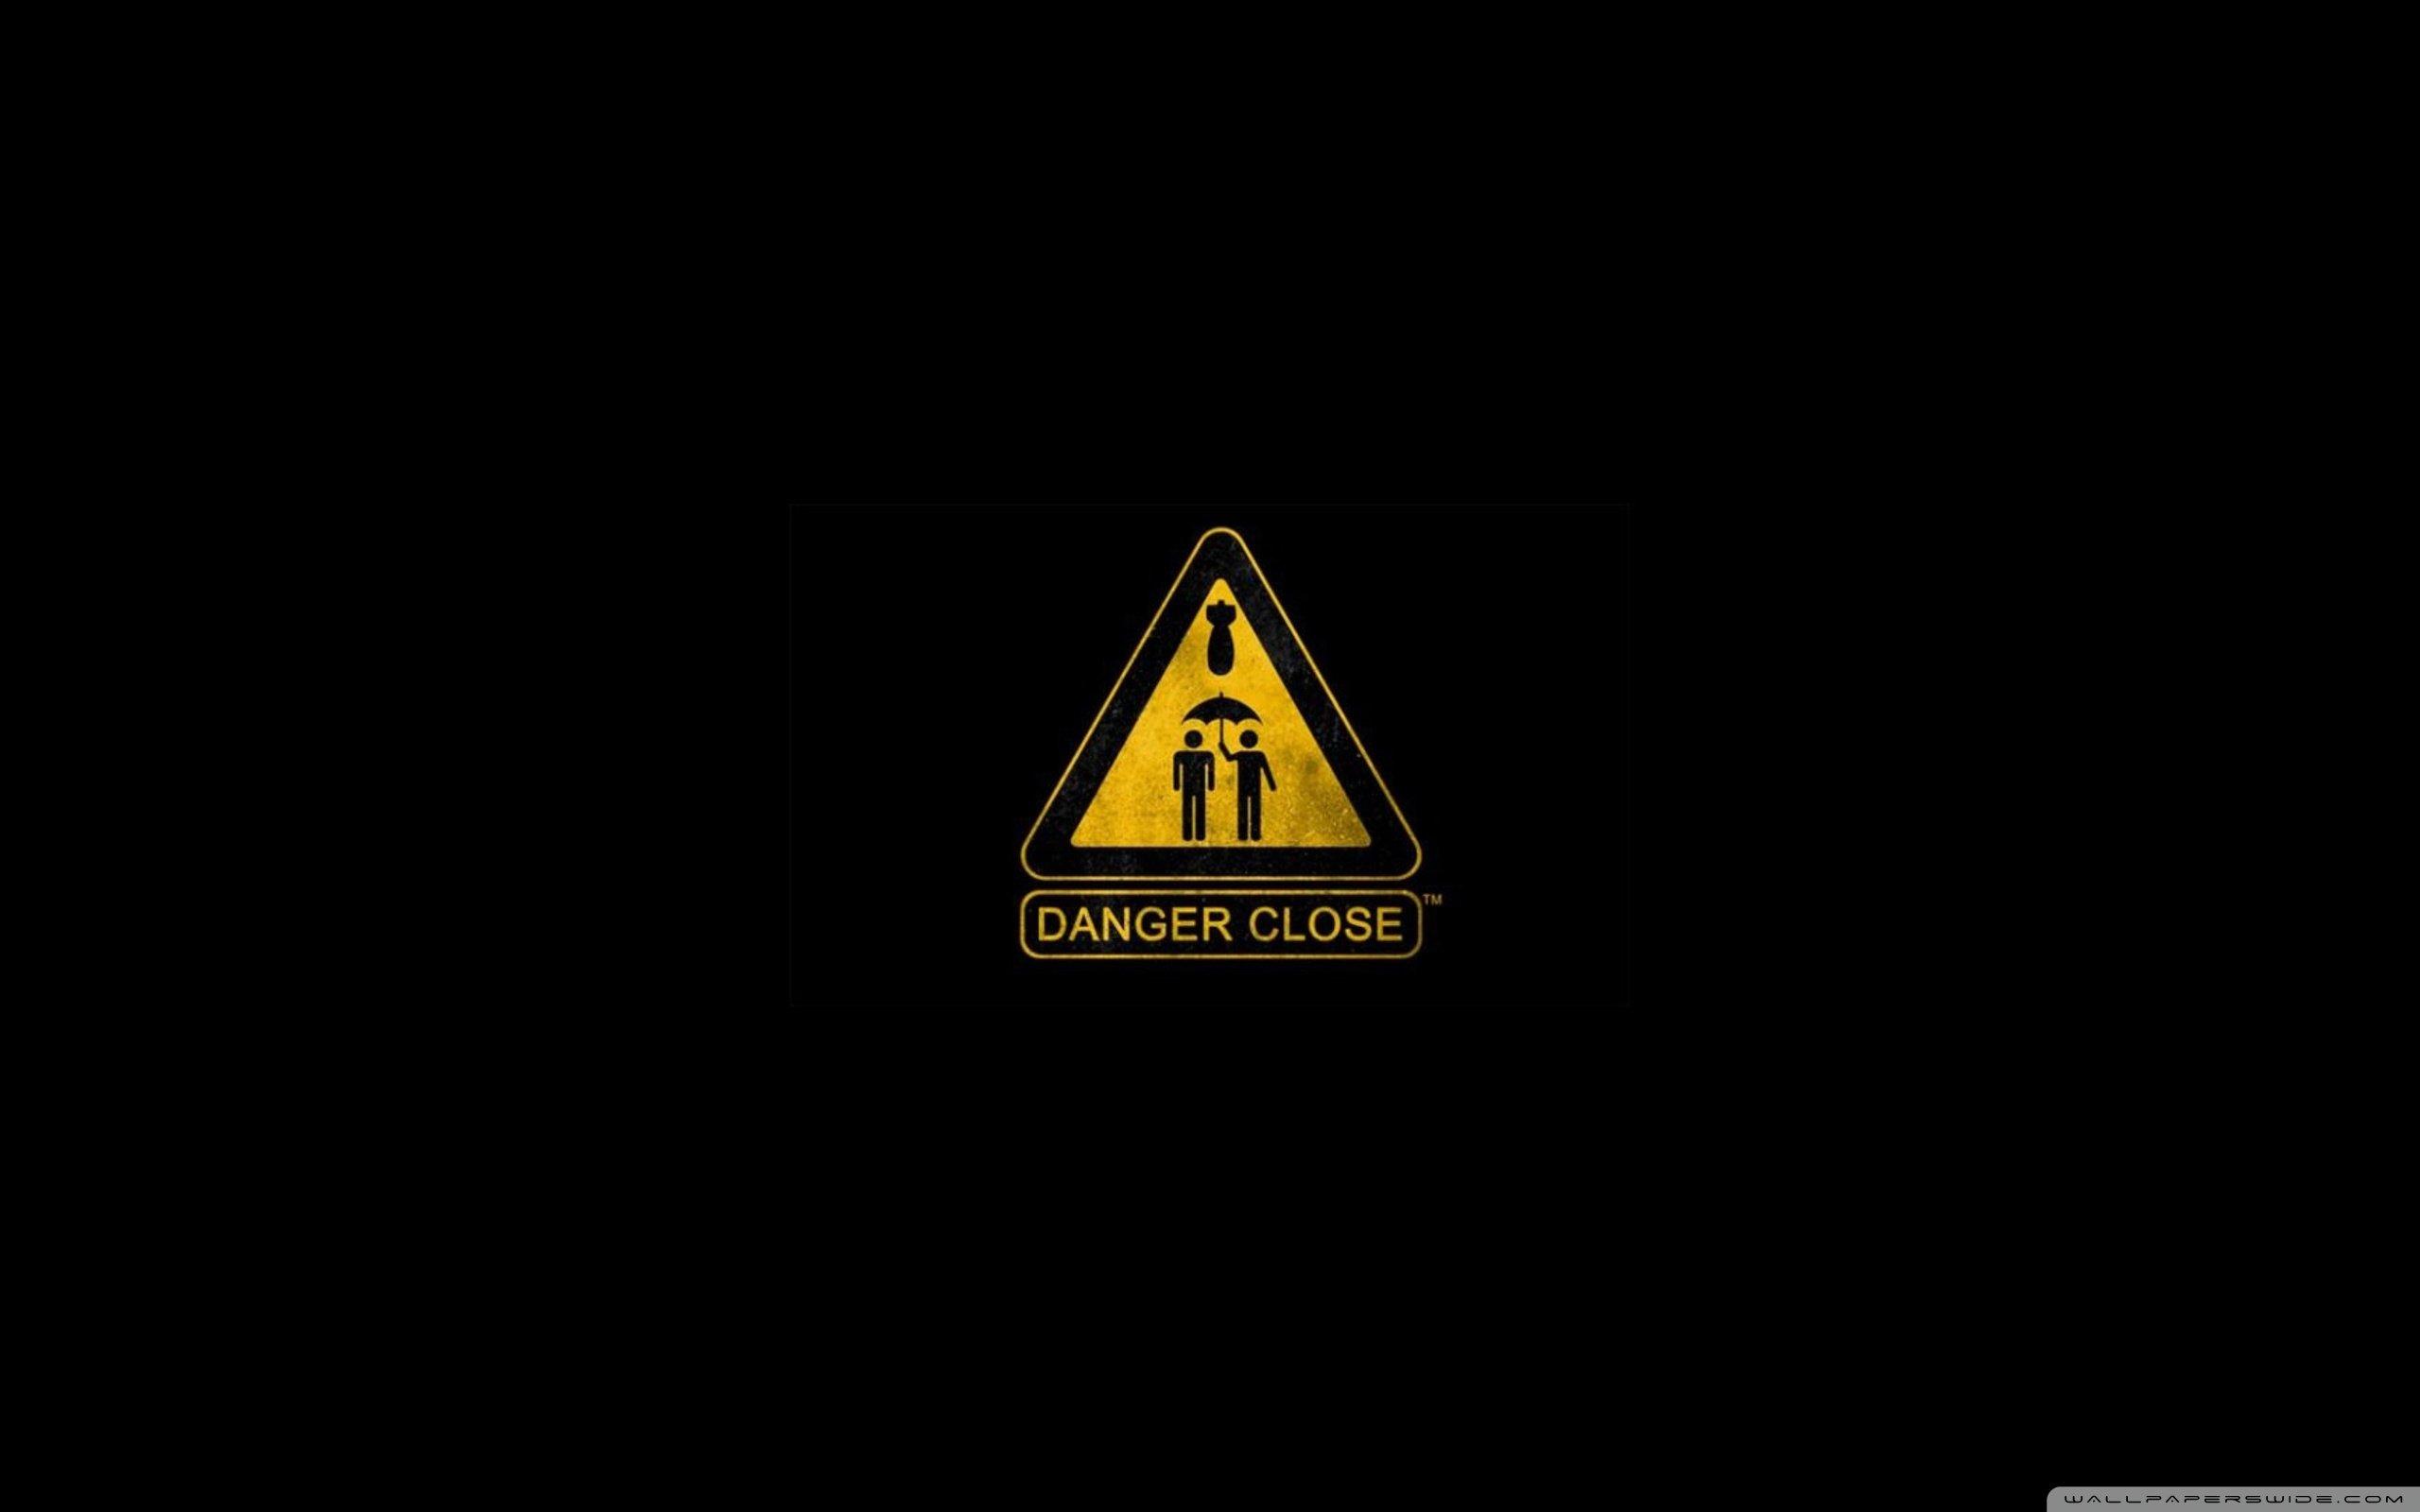 Warning sign-wallpaper-2560x1600 wallpaper | 2560x1600 | 239499 | WallpaperUP